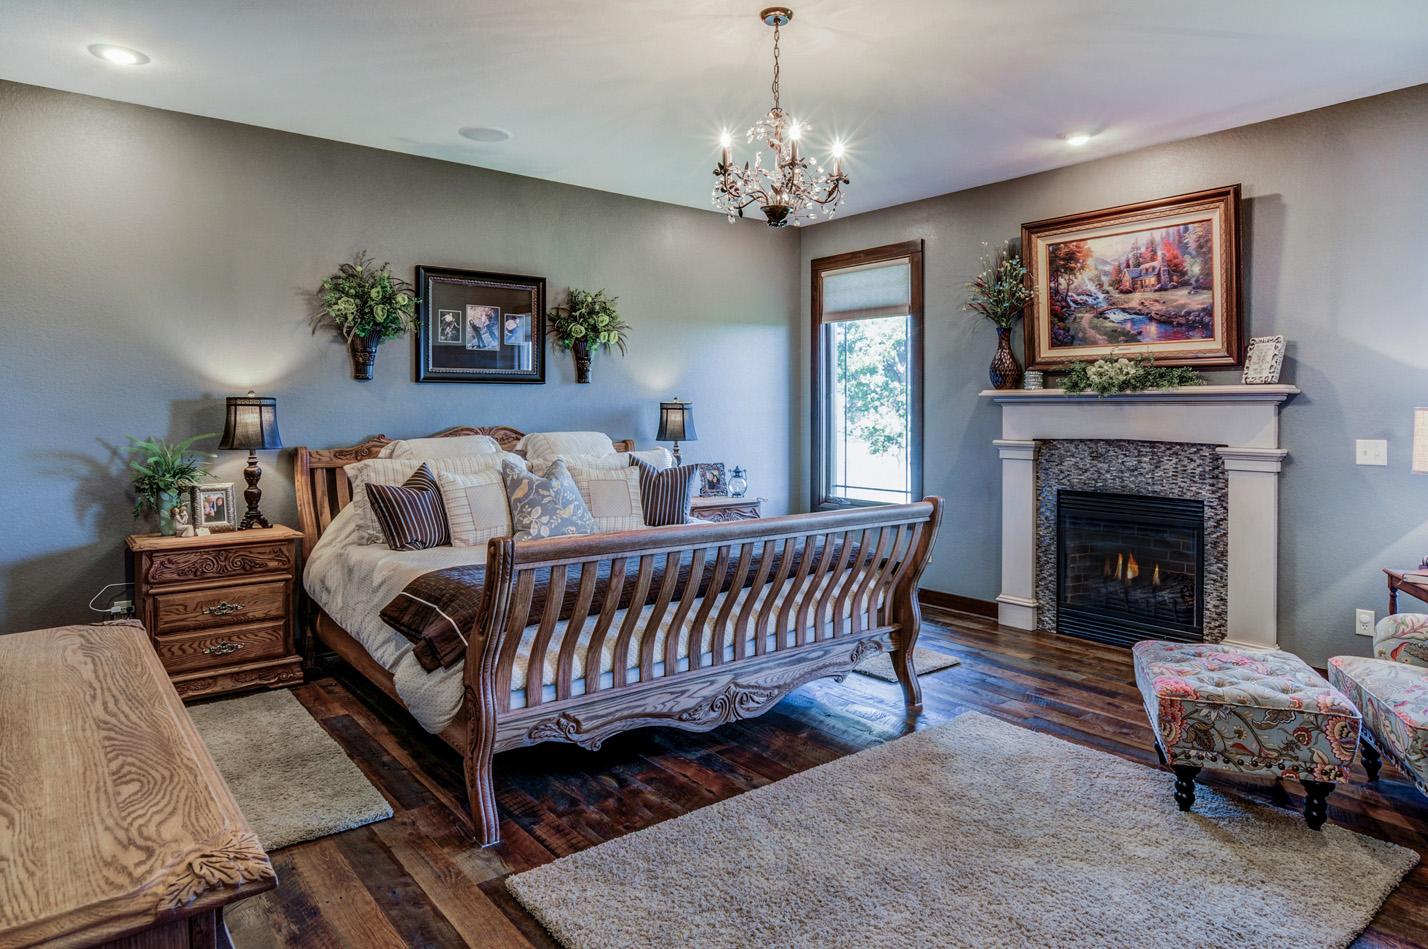 built-by-brett-custom-home-springfield-mo-rte-353-ww-013.jpg